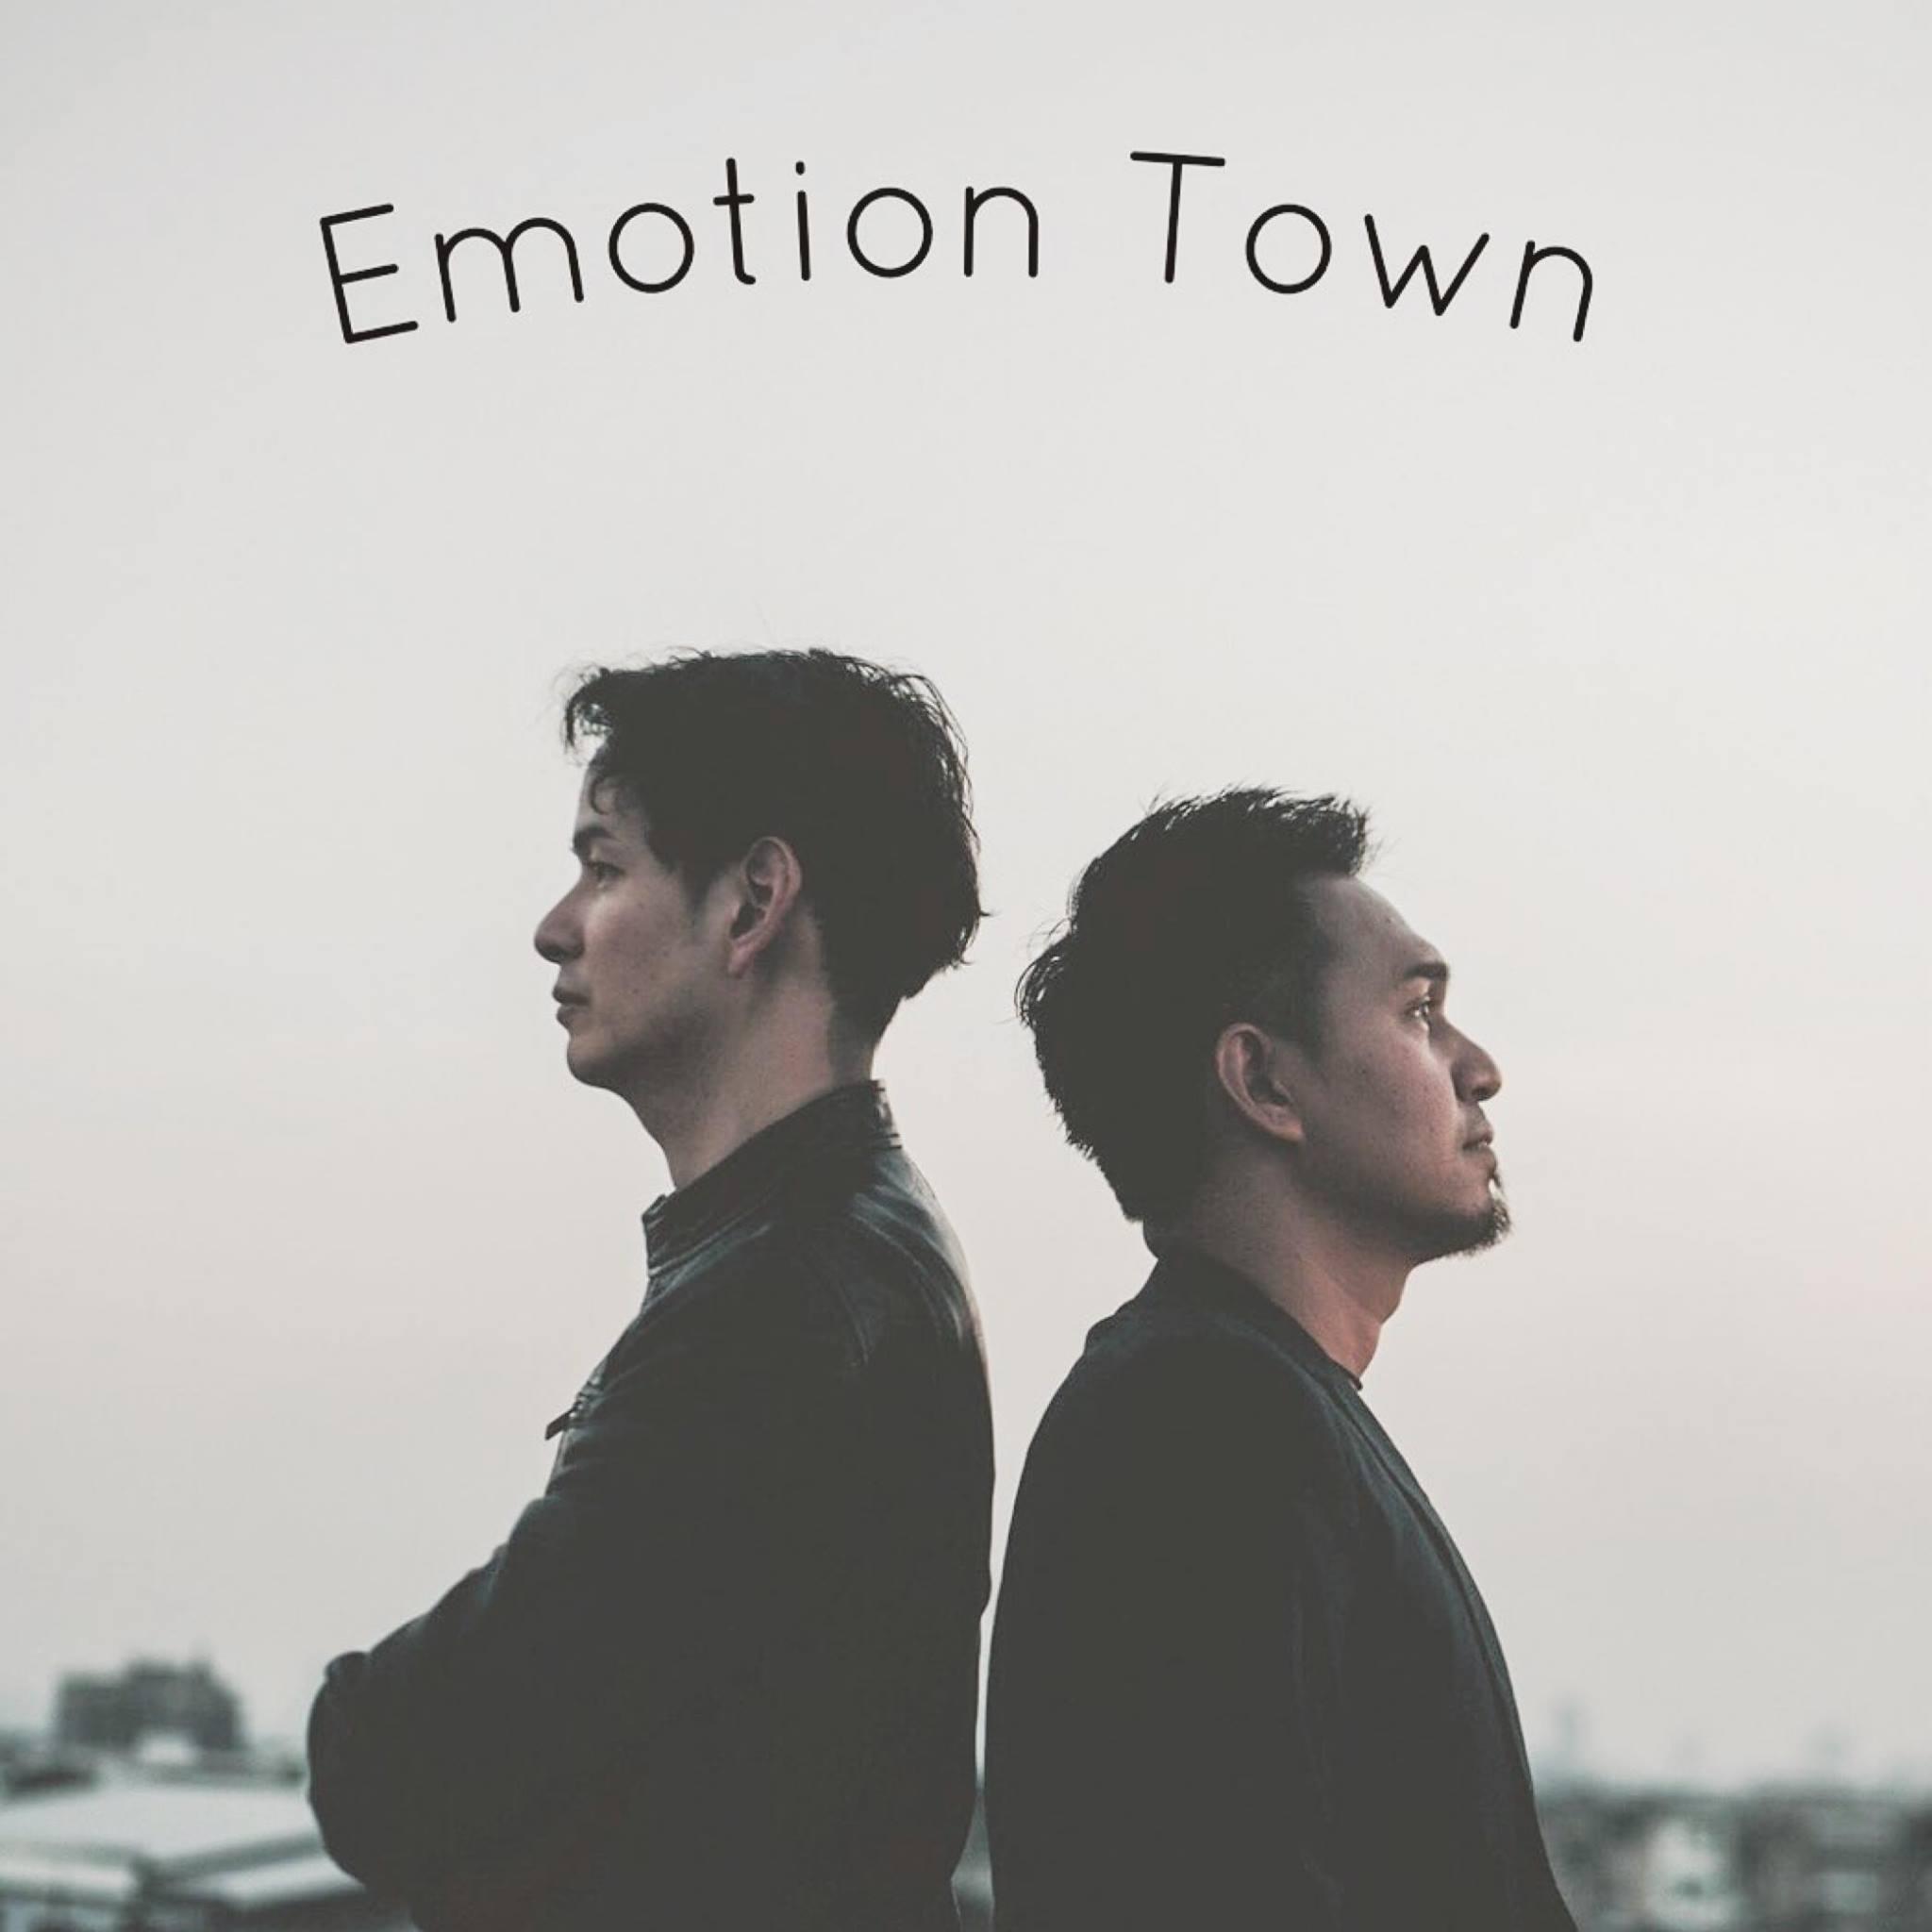 Emotion Town